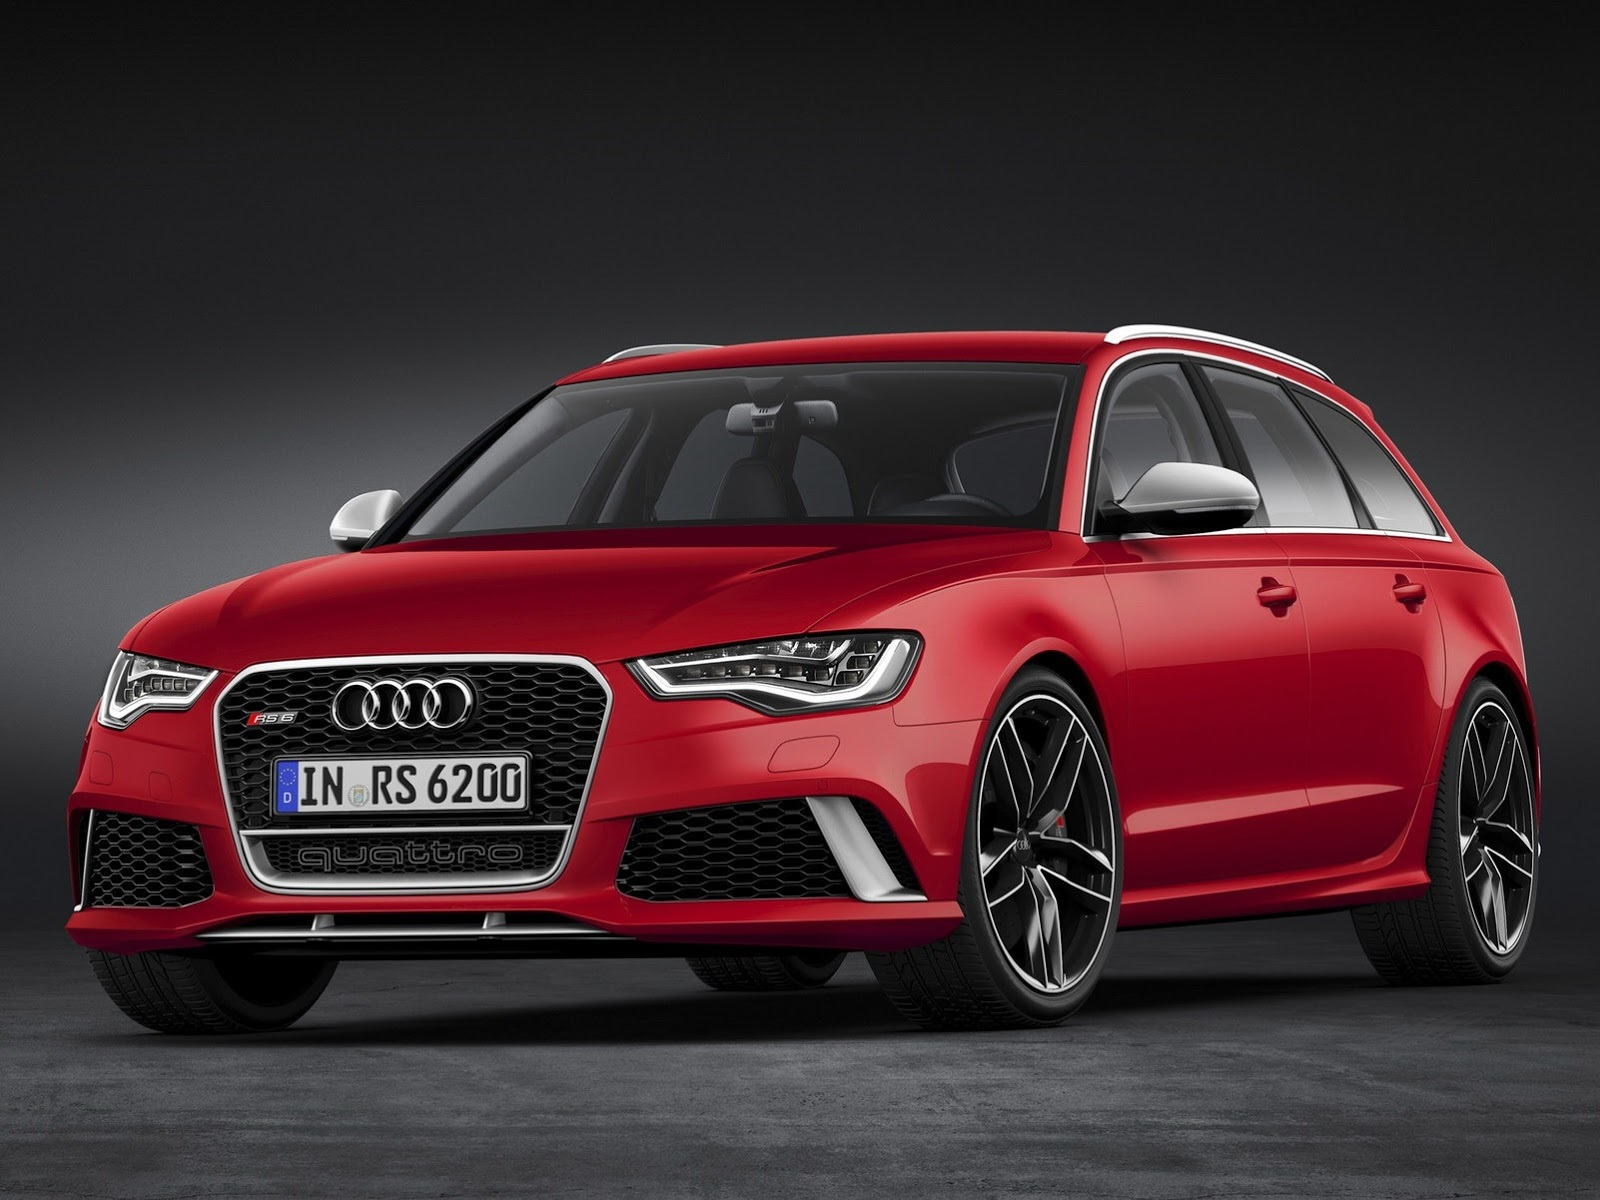 Foto de Audi RS6 Avant 2013 (4/8)